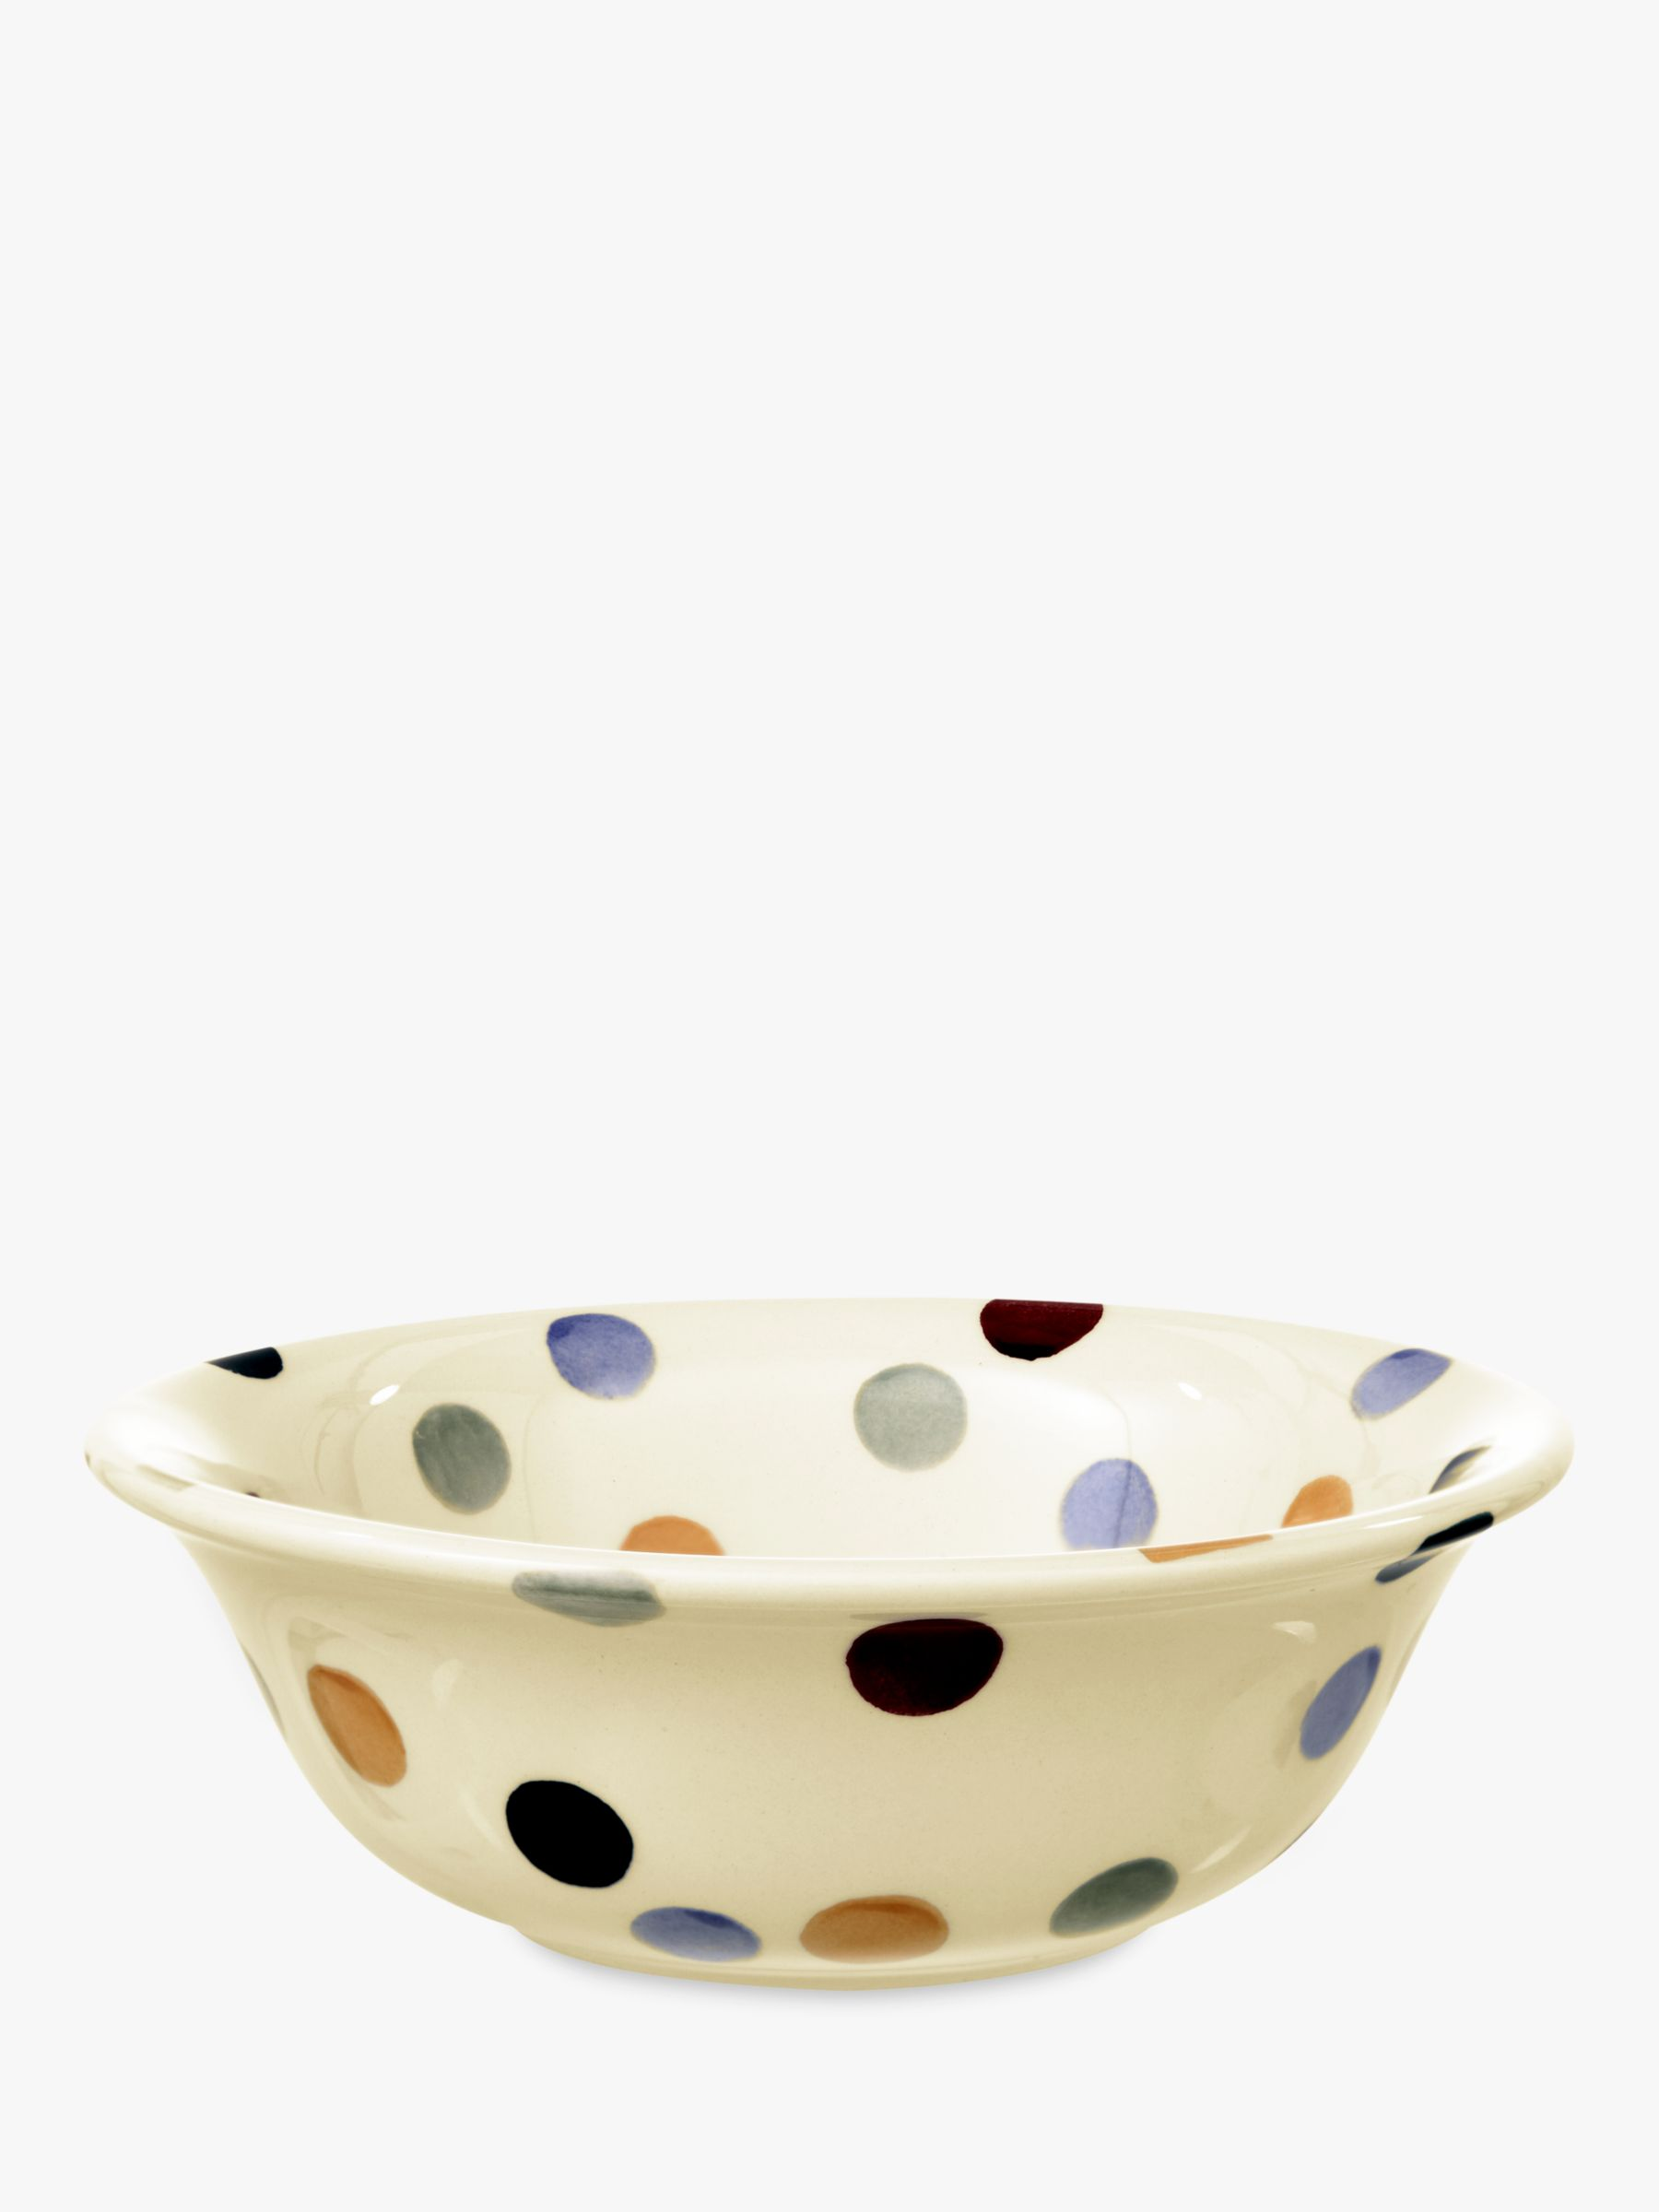 Emma Bridgewater Emma Bridgewater Polka Dot Cereal Bowl, Multi, Dia.16.5cm